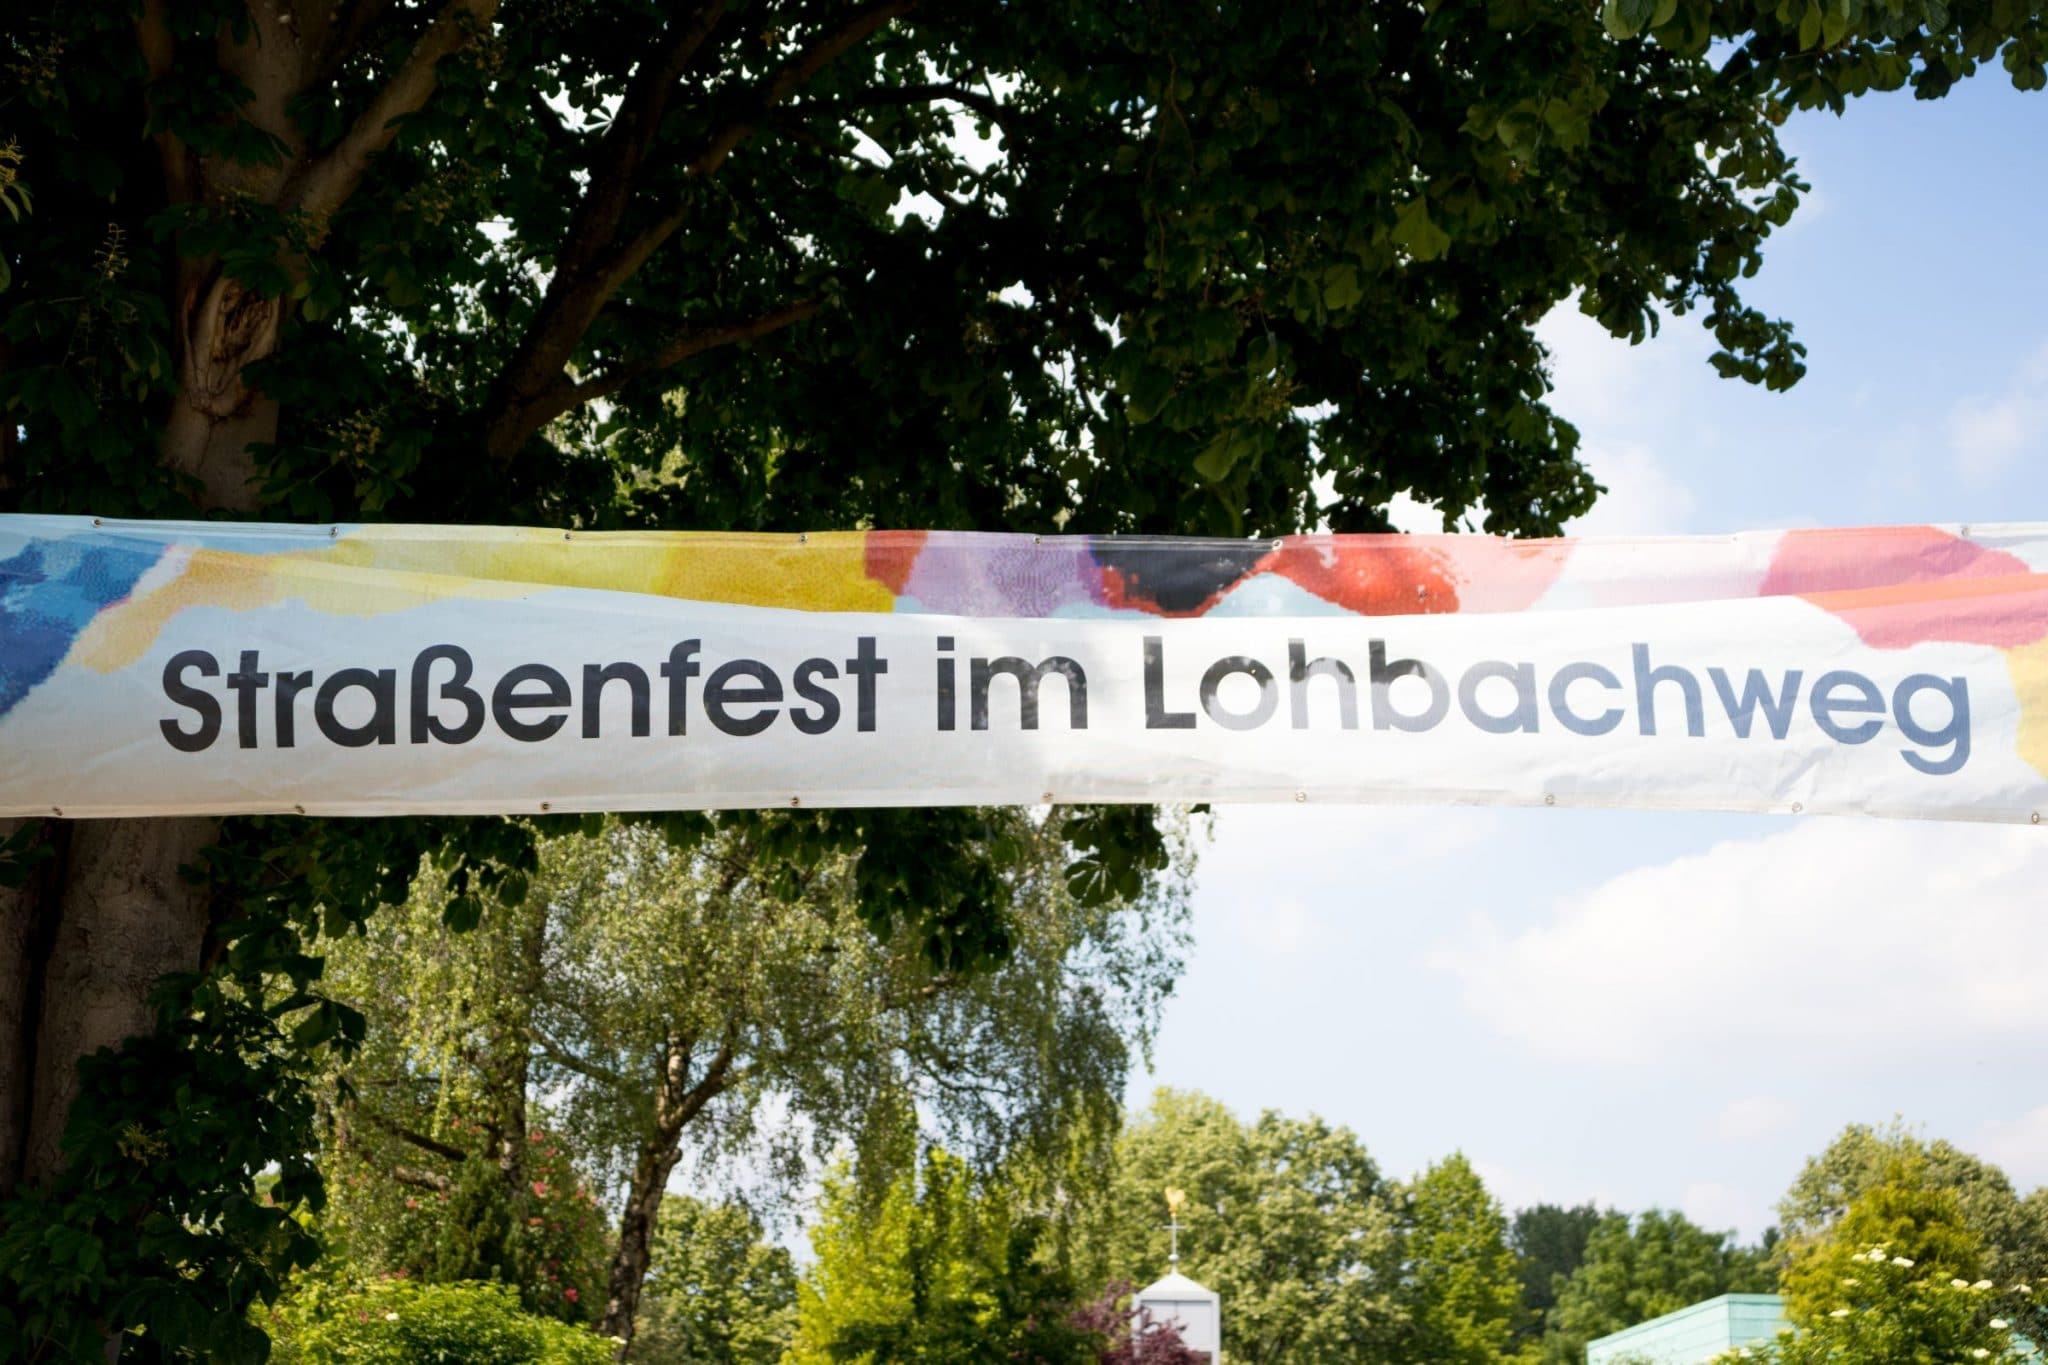 Straßenfest am Lohbachweg